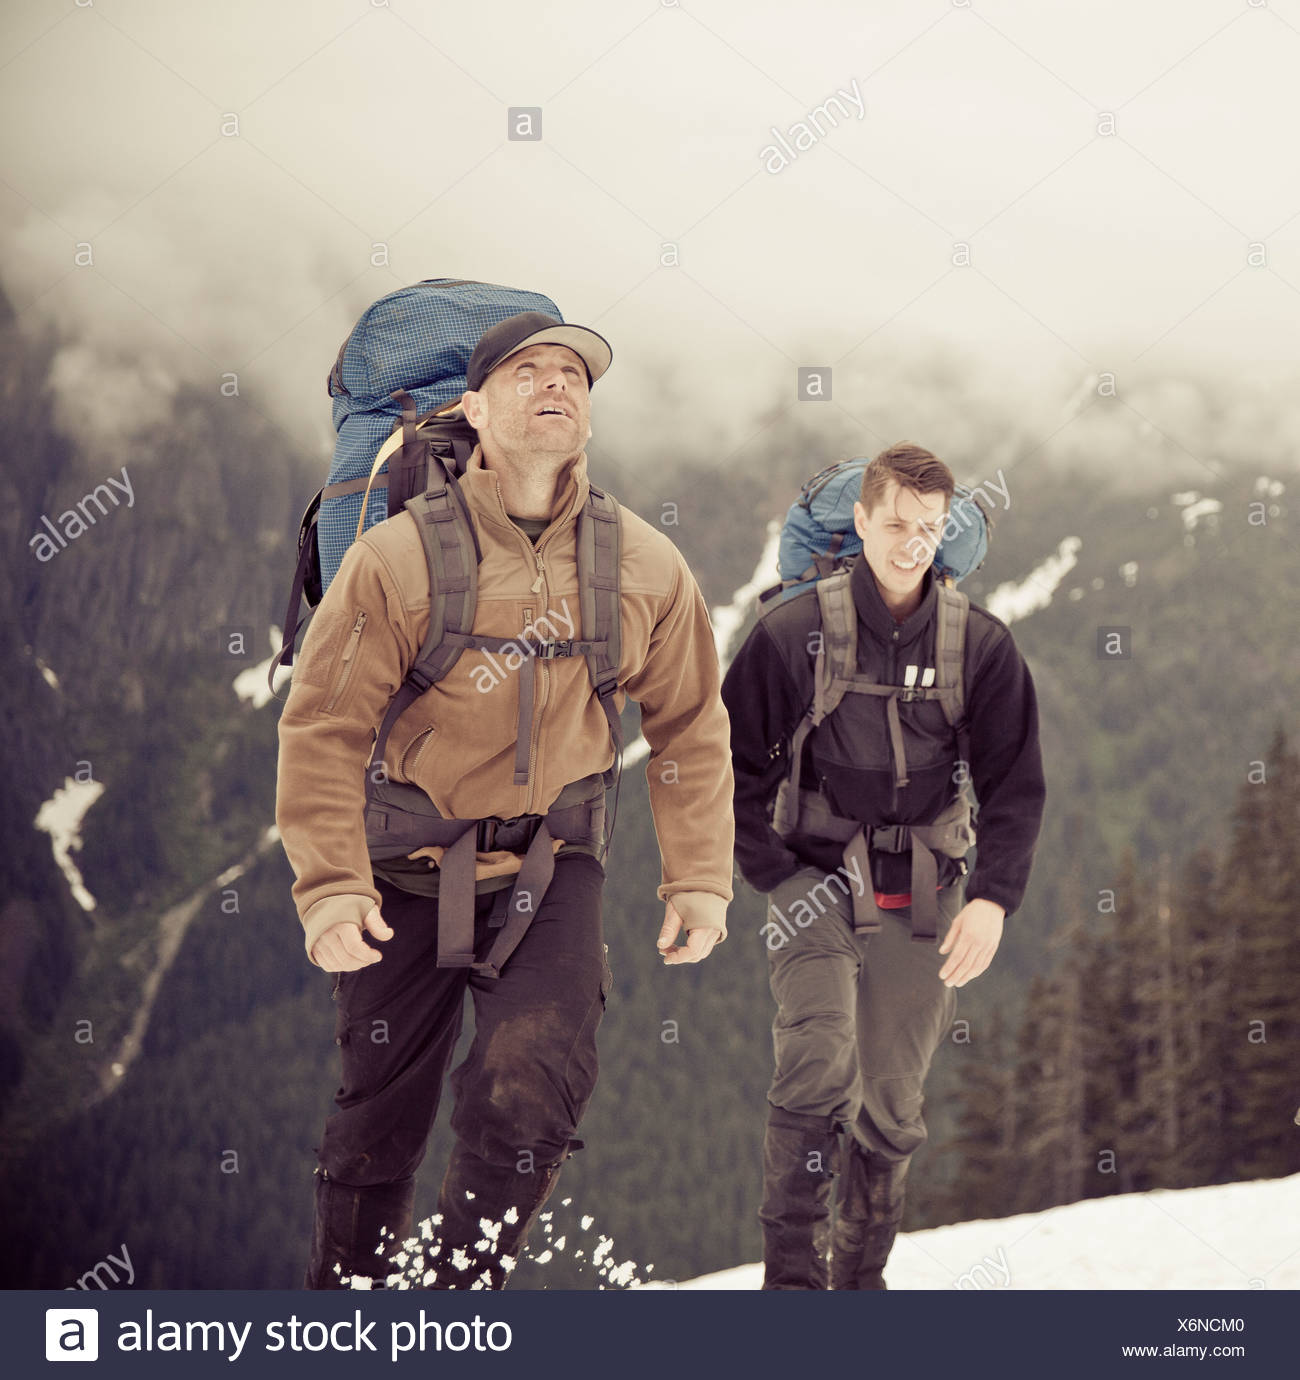 Backpacking - Stock Image